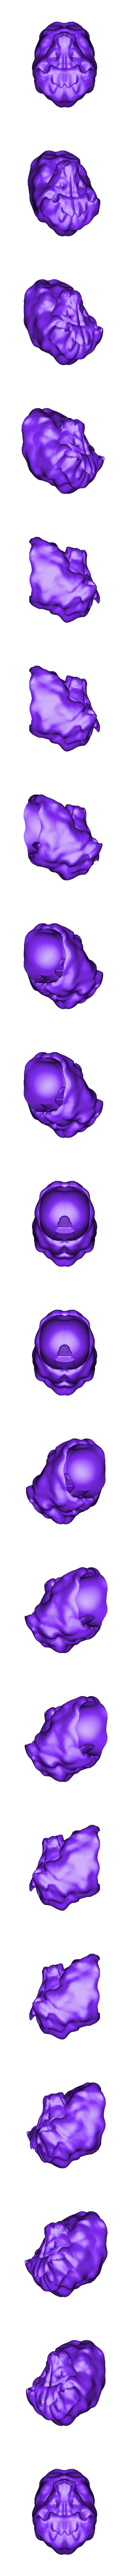 Lion_ball_lamp_head.obj Download free OBJ file Lion On Ball Nighlight/Lamp • 3D printable template, Pza4Rza